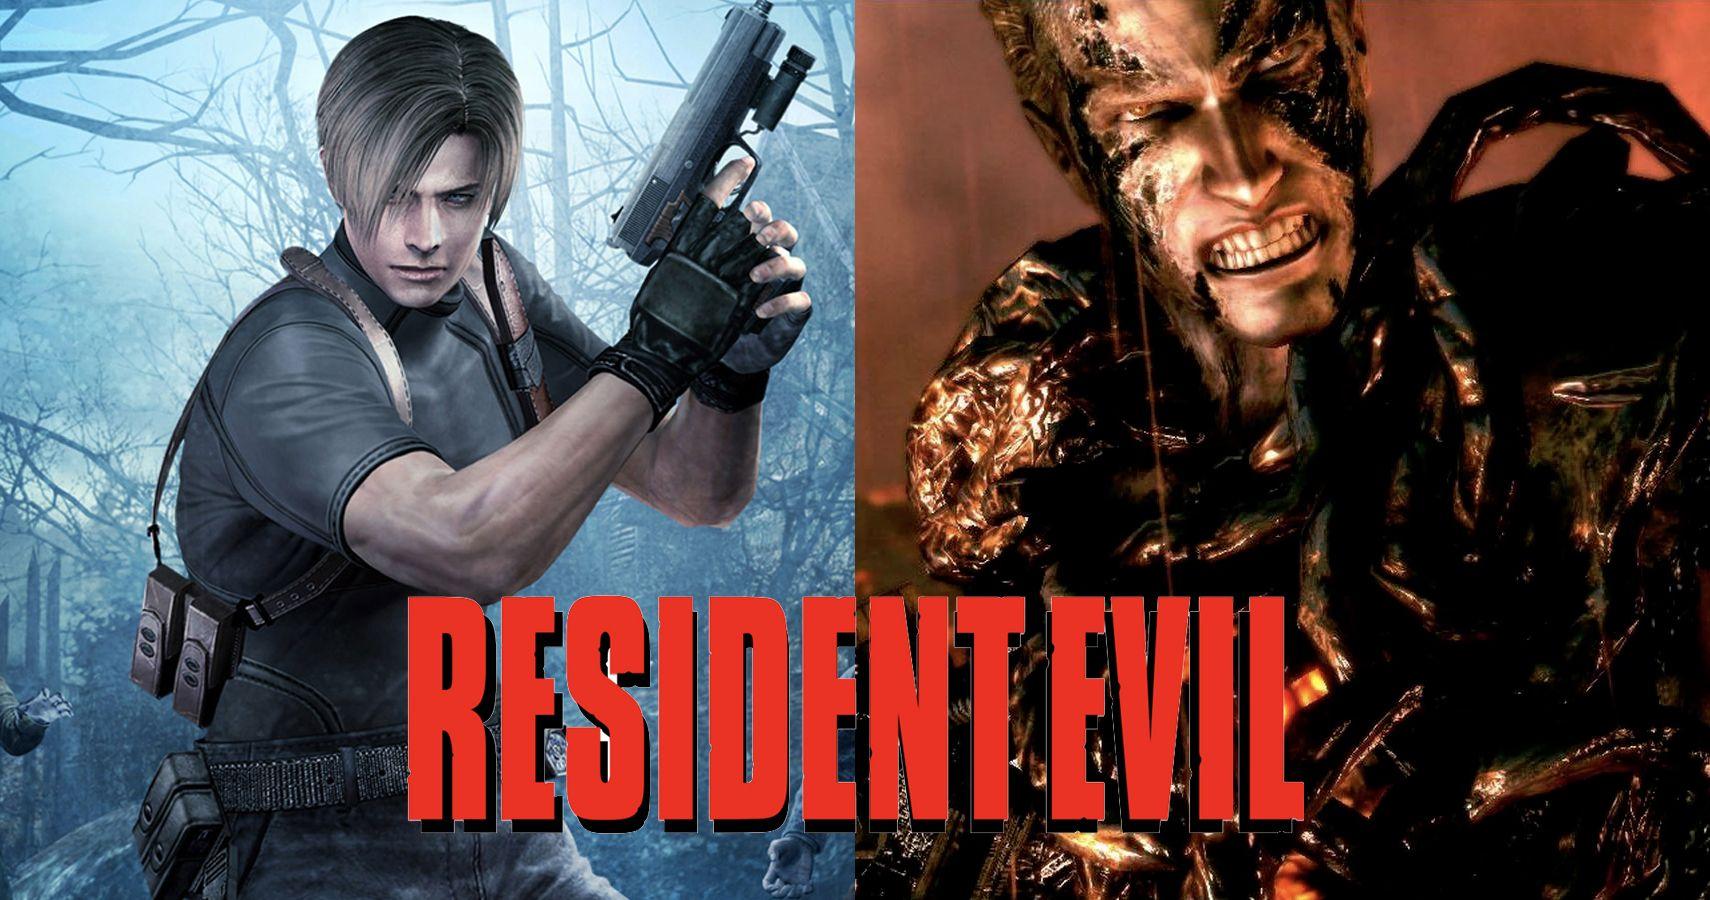 Resident Evil Makes No Sense Whatsoever Major Series Plot Holes